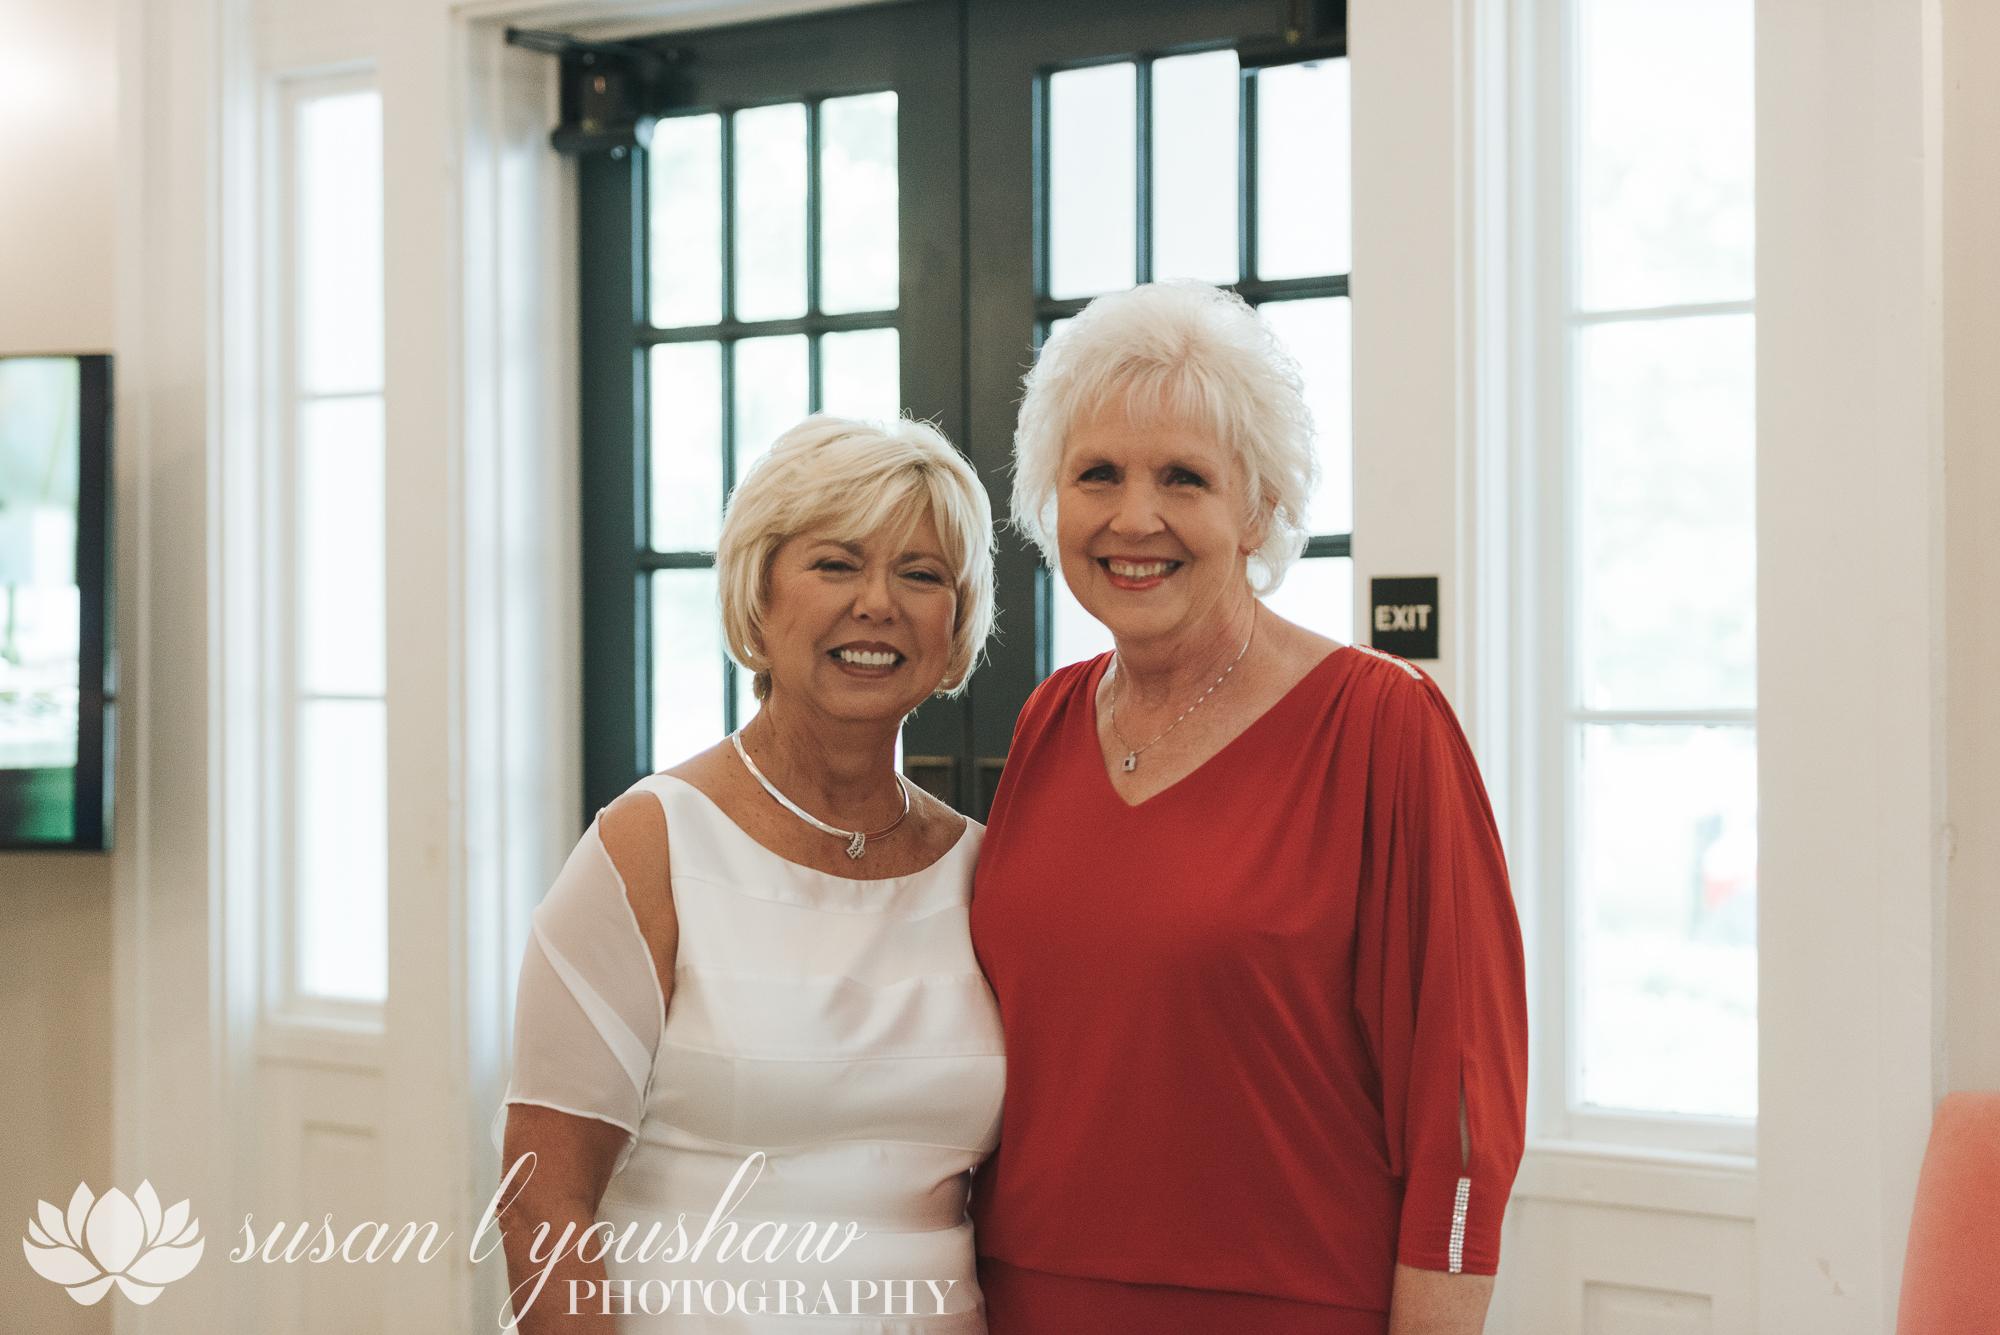 BLOG Carolyn Adams and Jim McCune 07-04-2018 SLY Photography-46.jpg